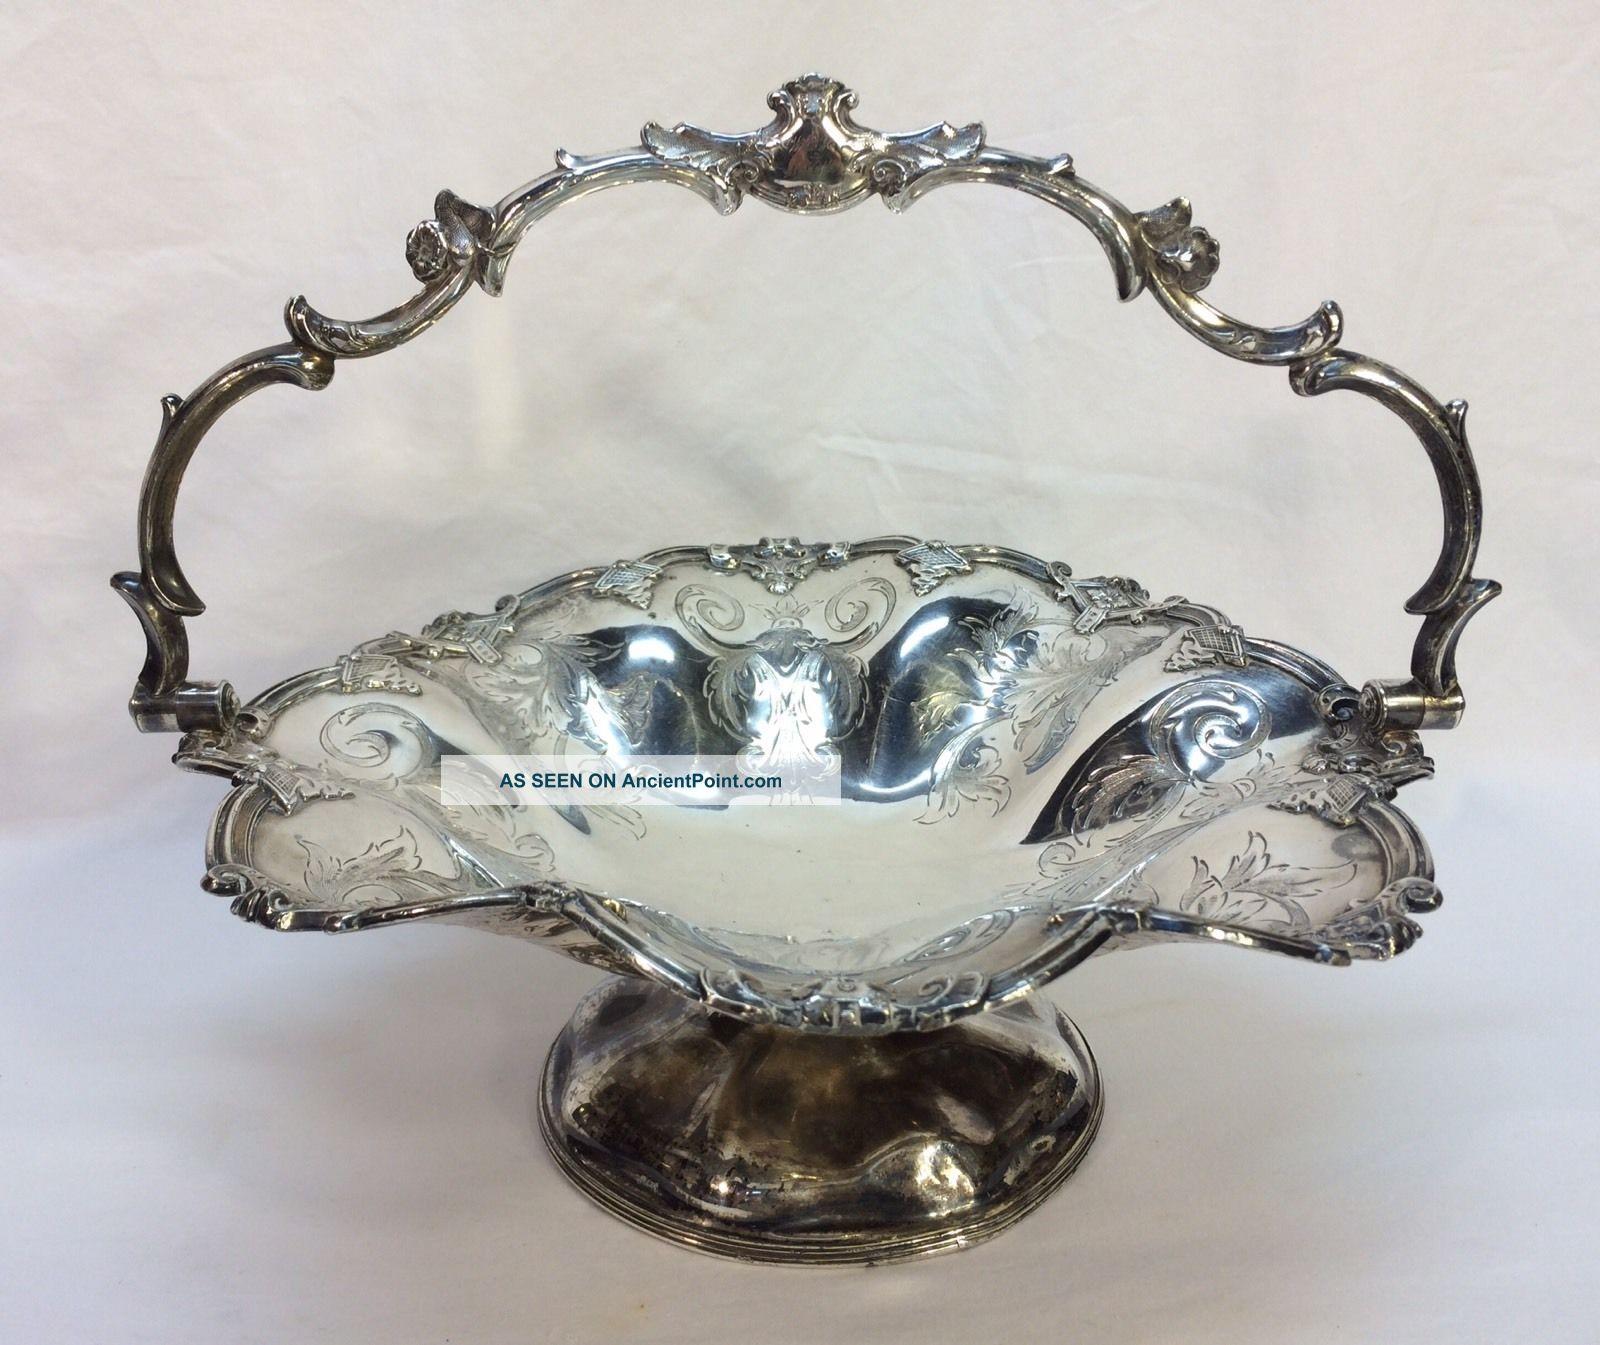 Antique James Dixon & Sons Sheffield Engraved Silver Plate Basket Bowl Baskets photo